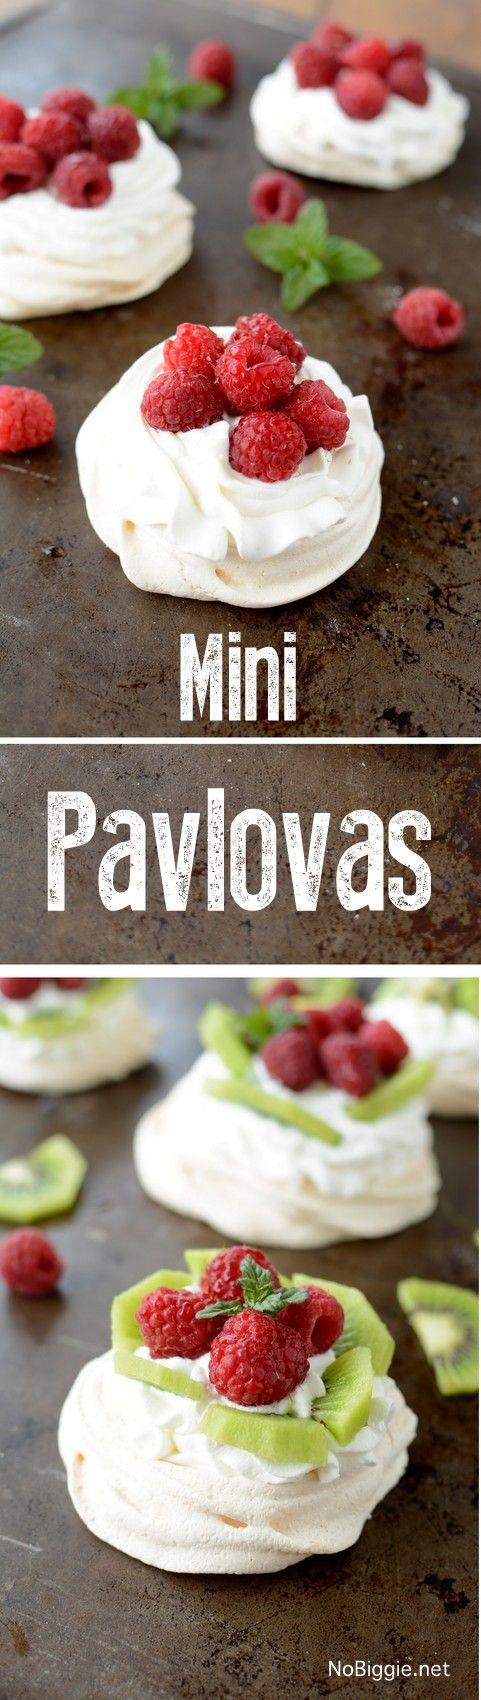 Mini Pavlovas with fresh fruit and fresh berries - so good!   recipe on NoBiggie.net